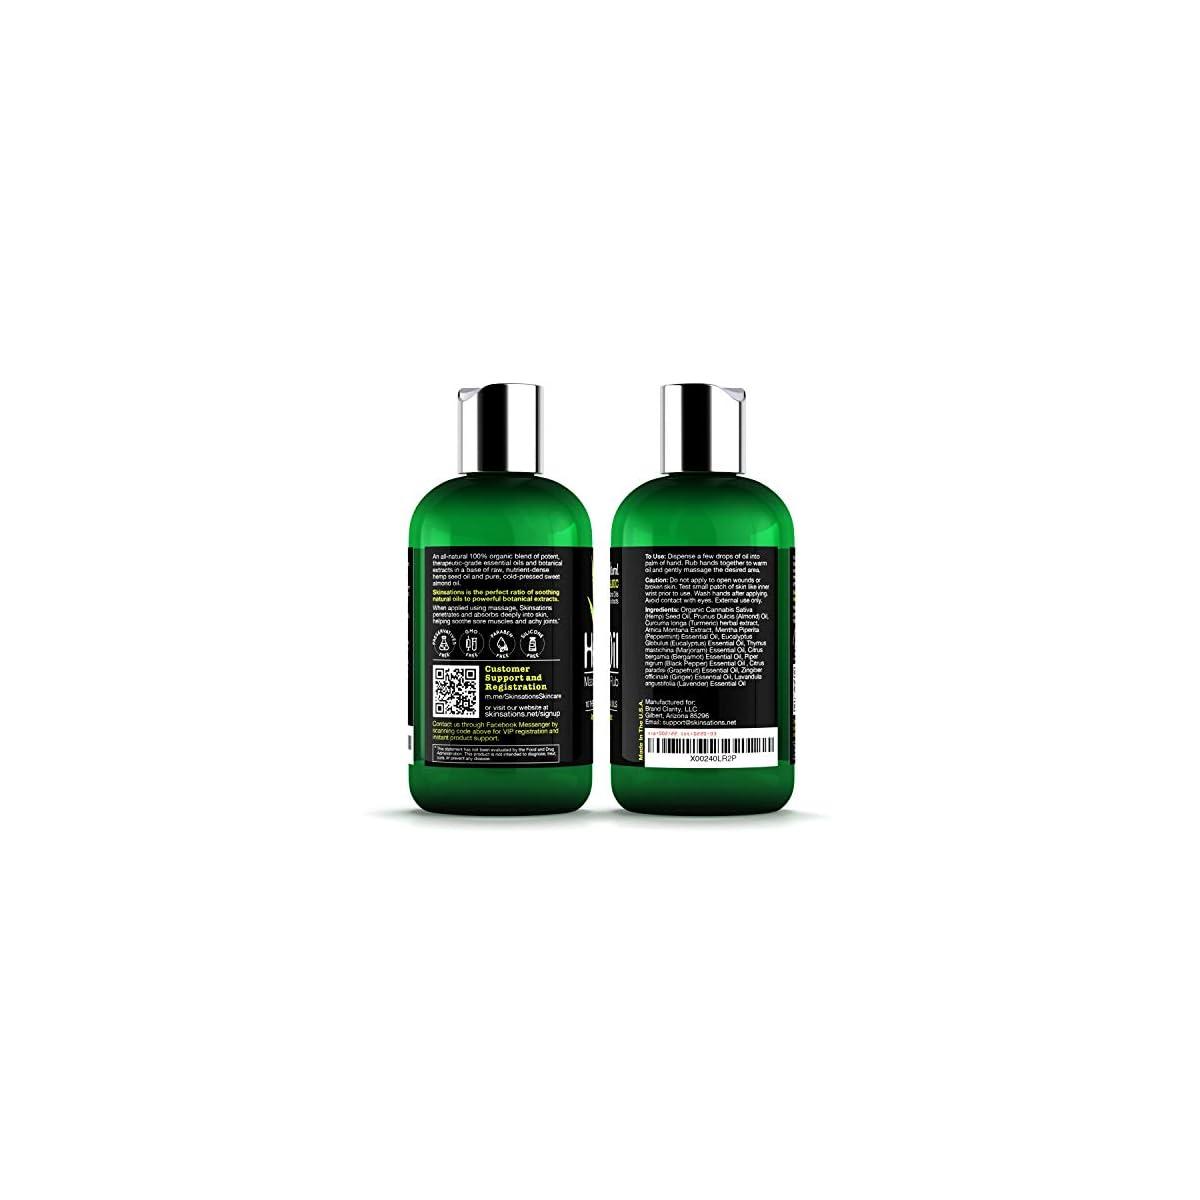 Skinsations--Hemp-Oil-Muscle-Rub-Massage-Oil